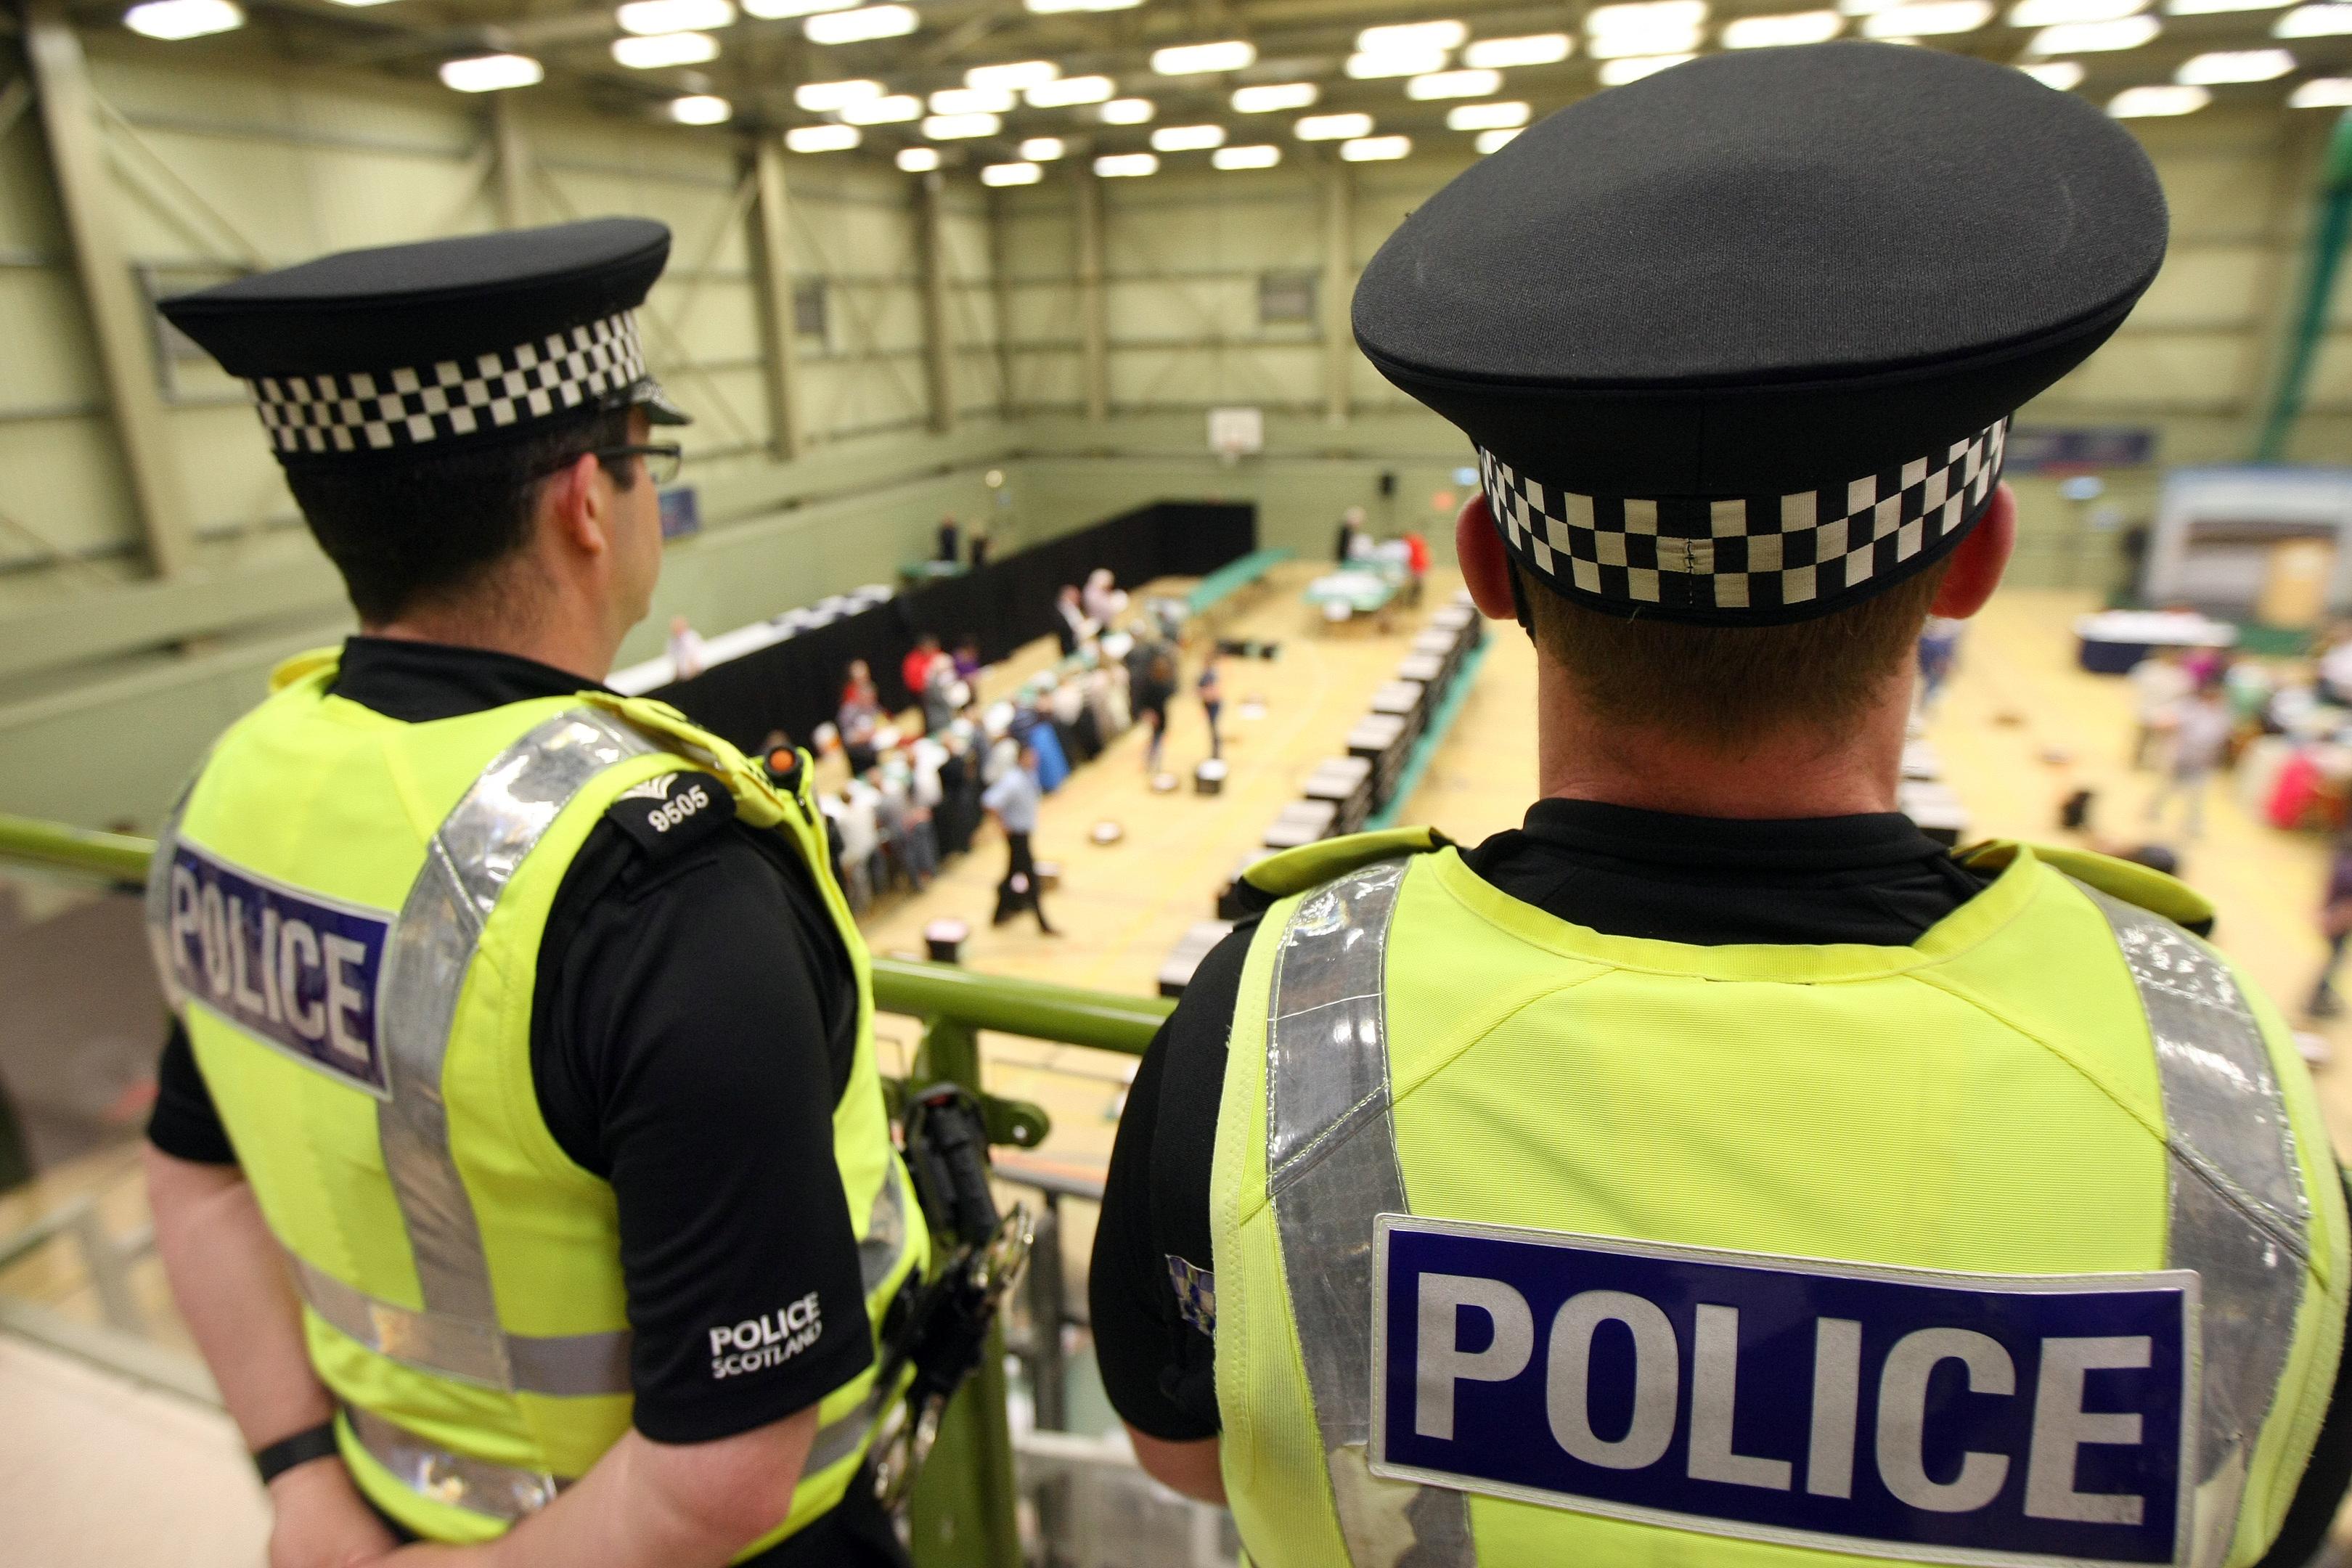 Police Scotland keeping an eye on proceedings tonight.